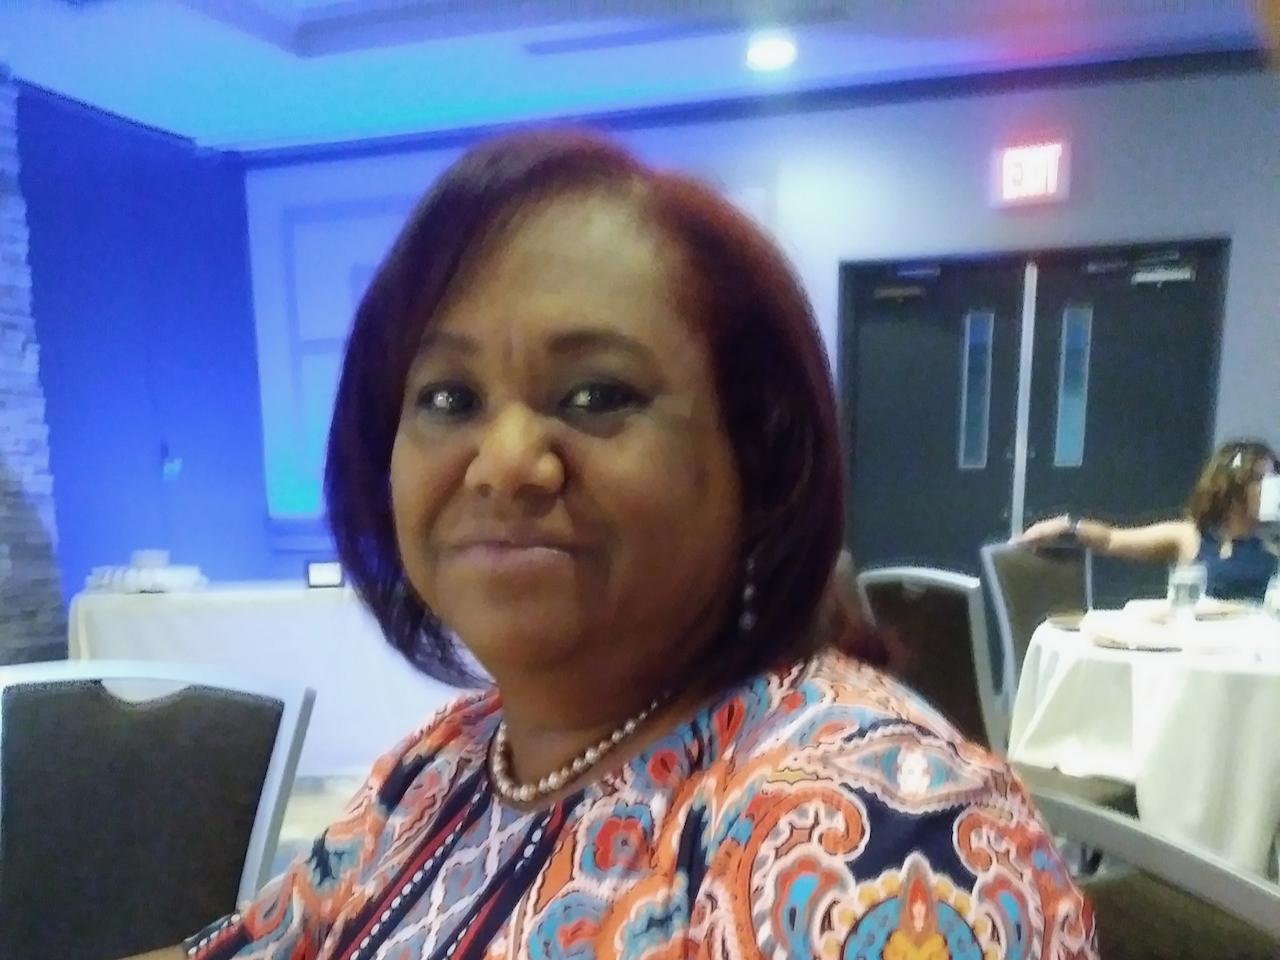 Margarita Pons, Aggregation Coordinator, SCLT